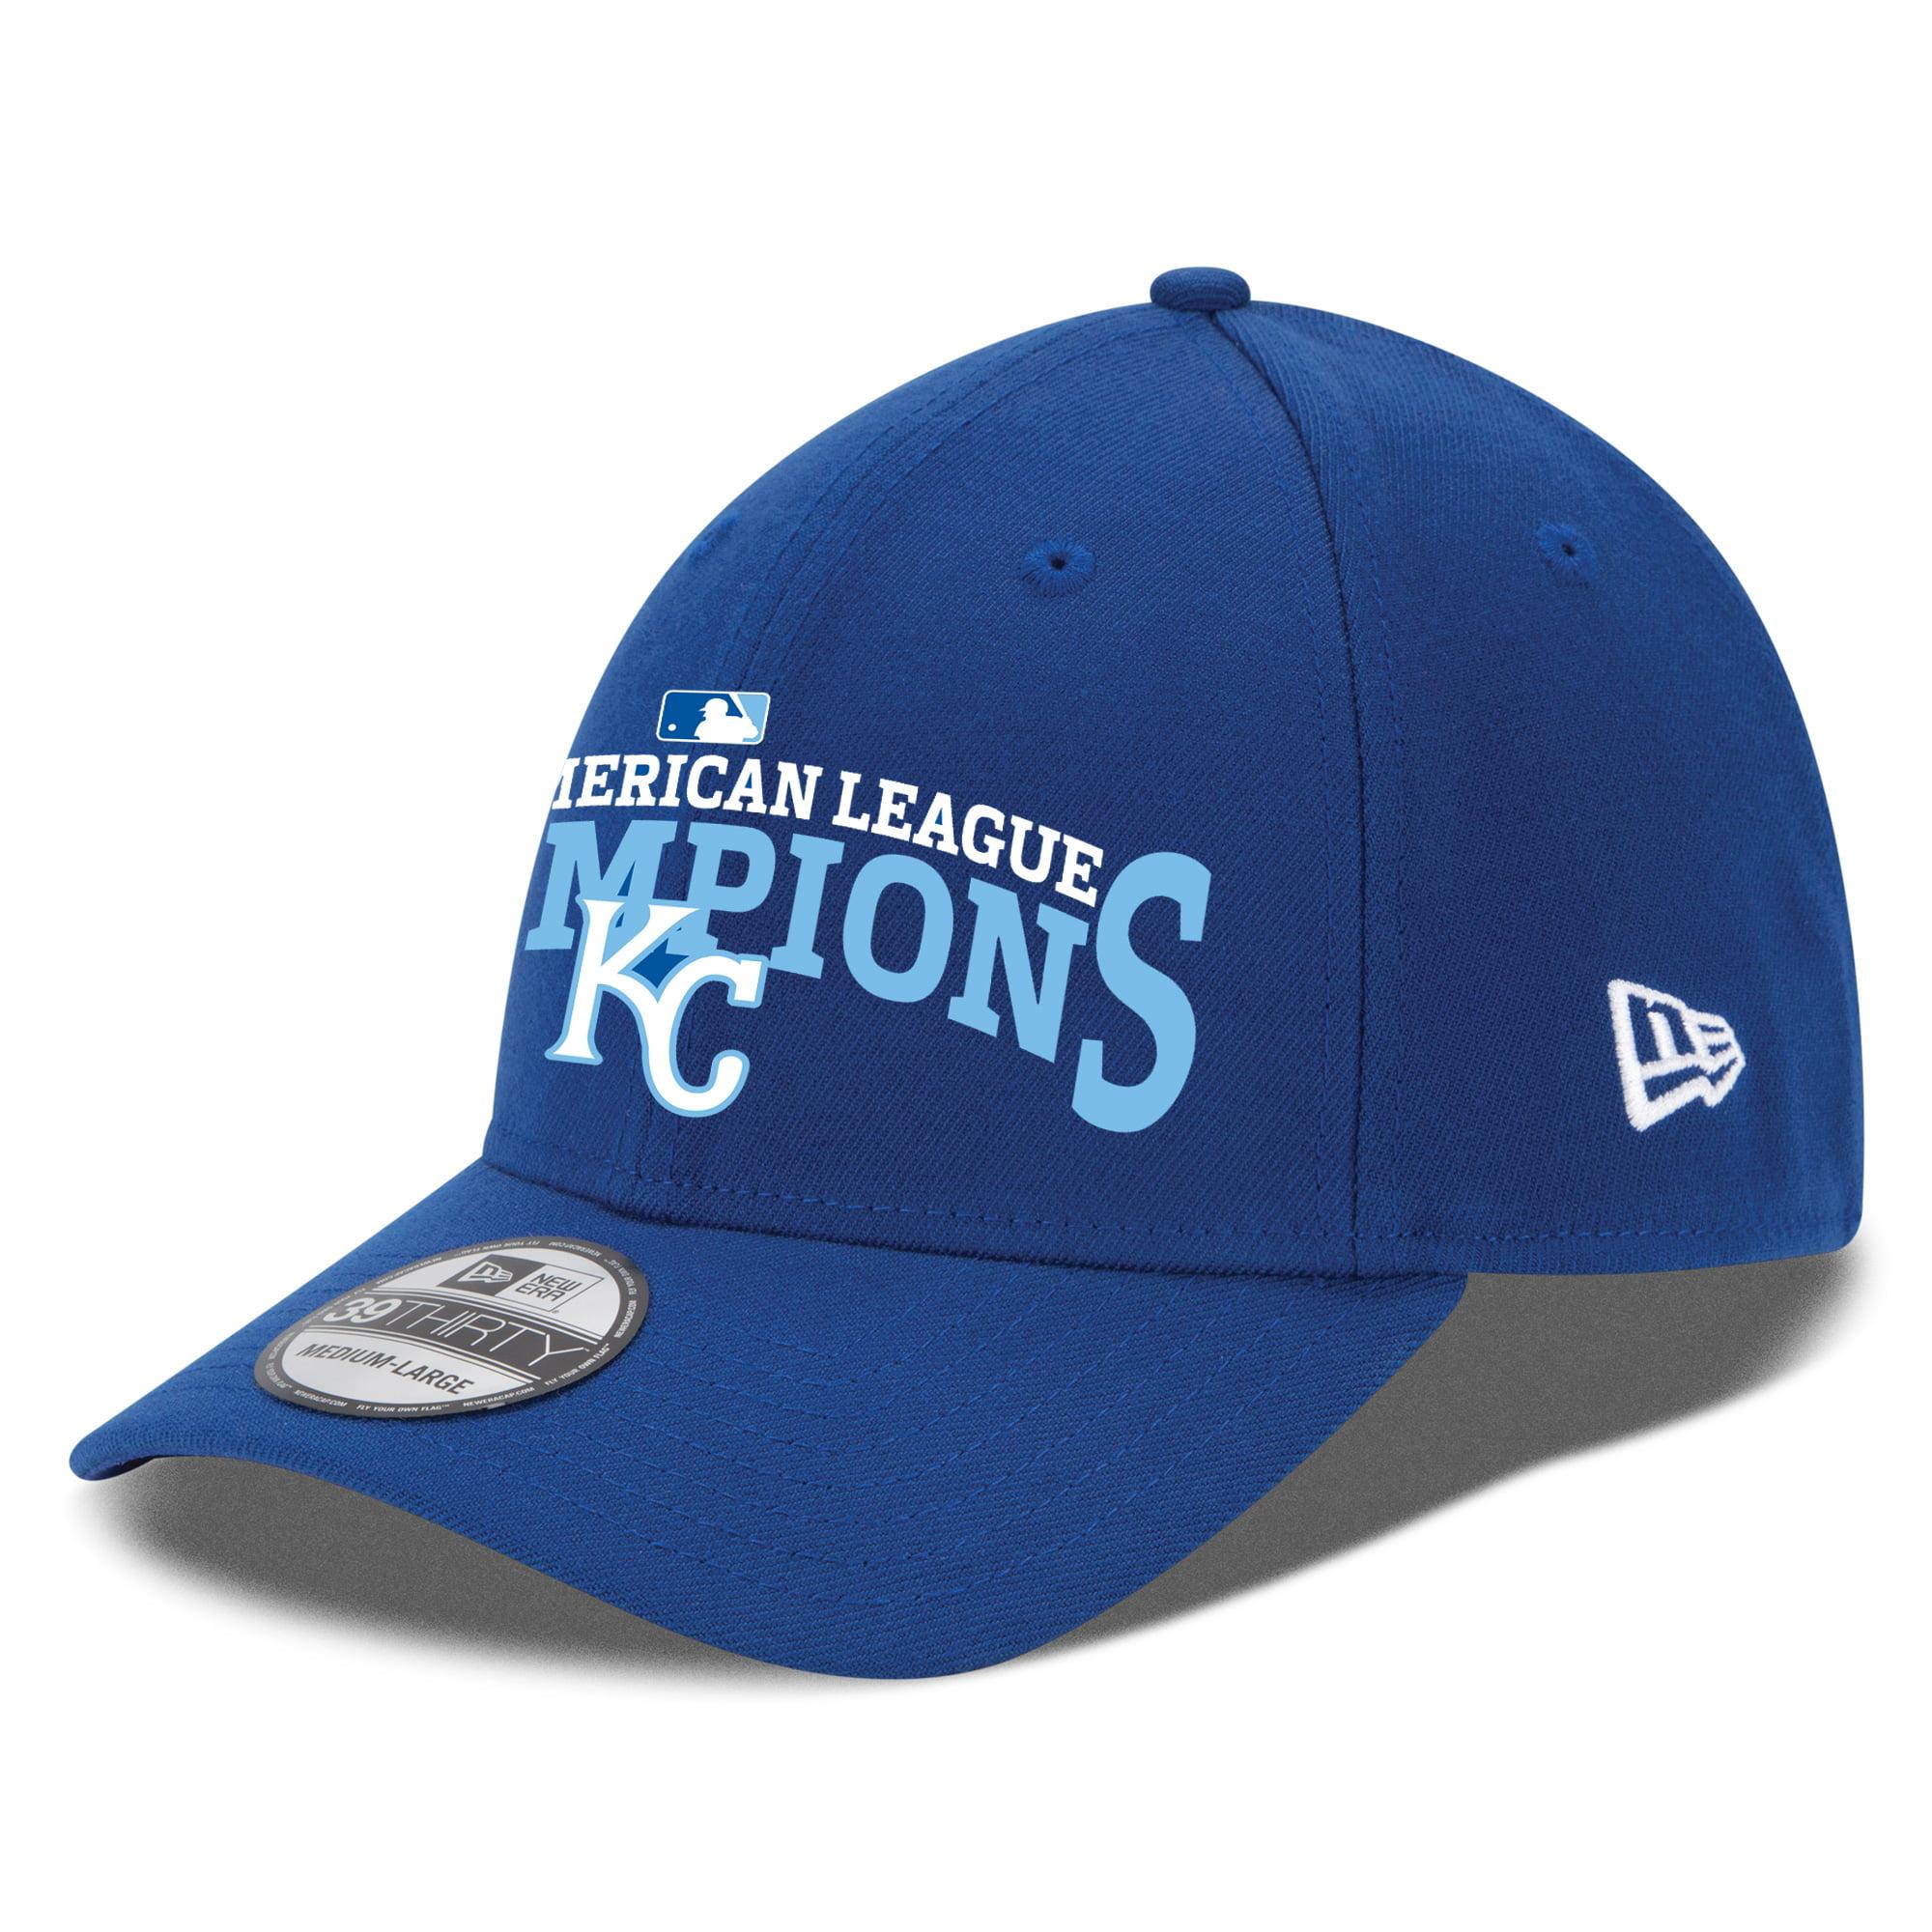 Kansas City Royals New Era 2015 American League Champions 39THIRTY Flex Hat - Royal